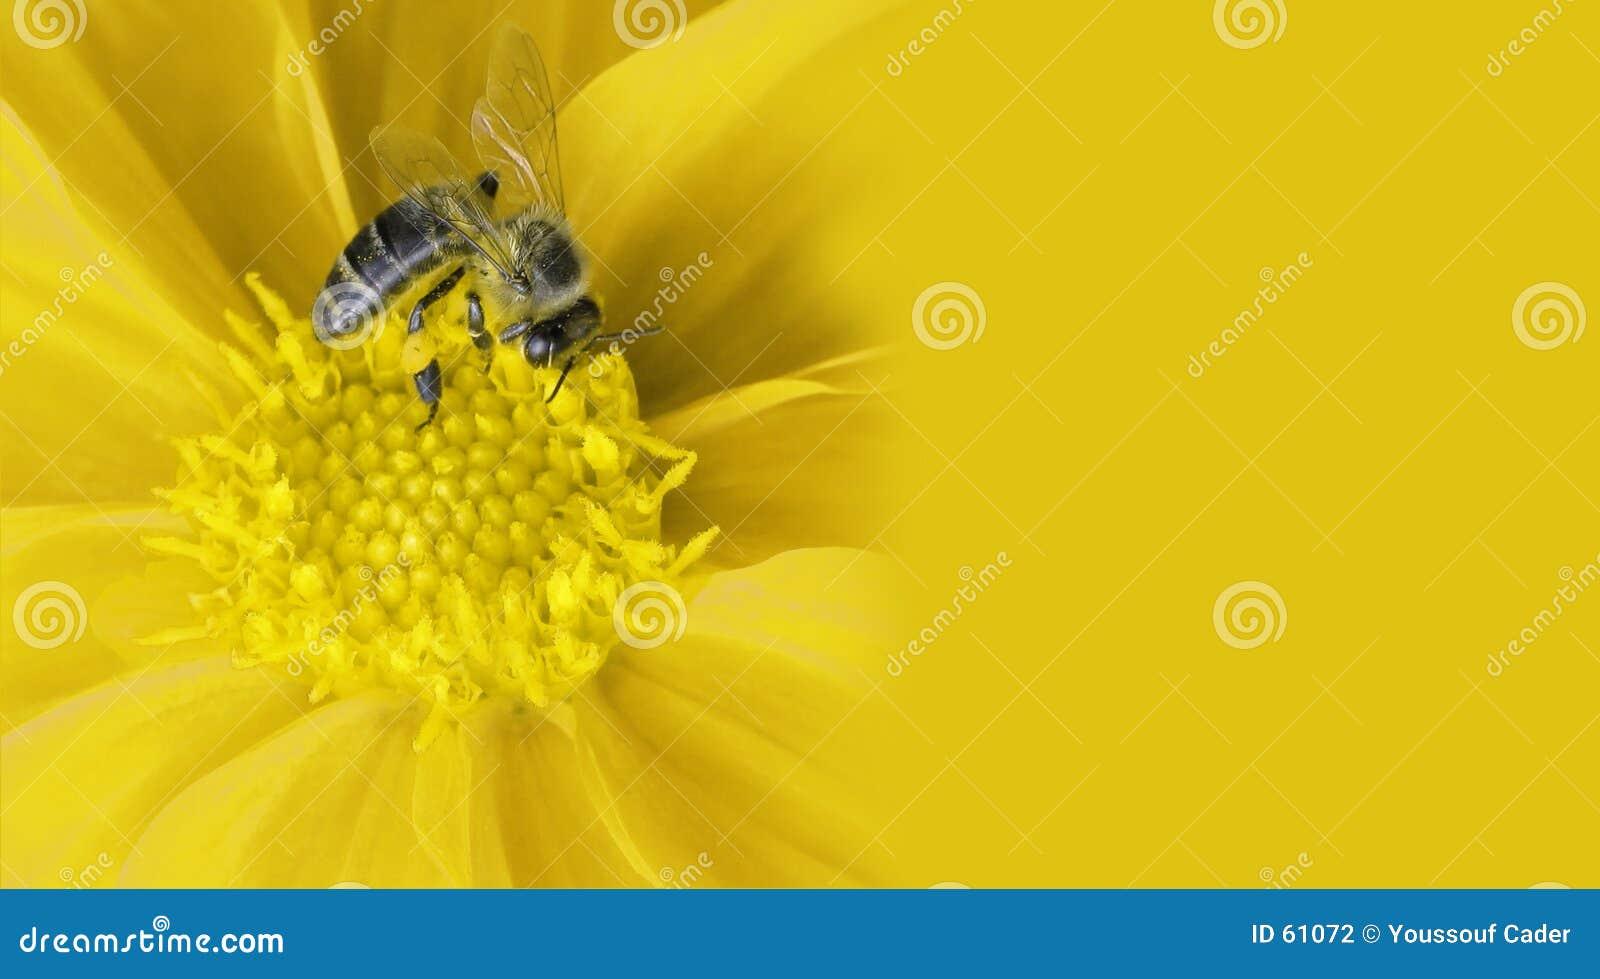 Abelha do mel na flor